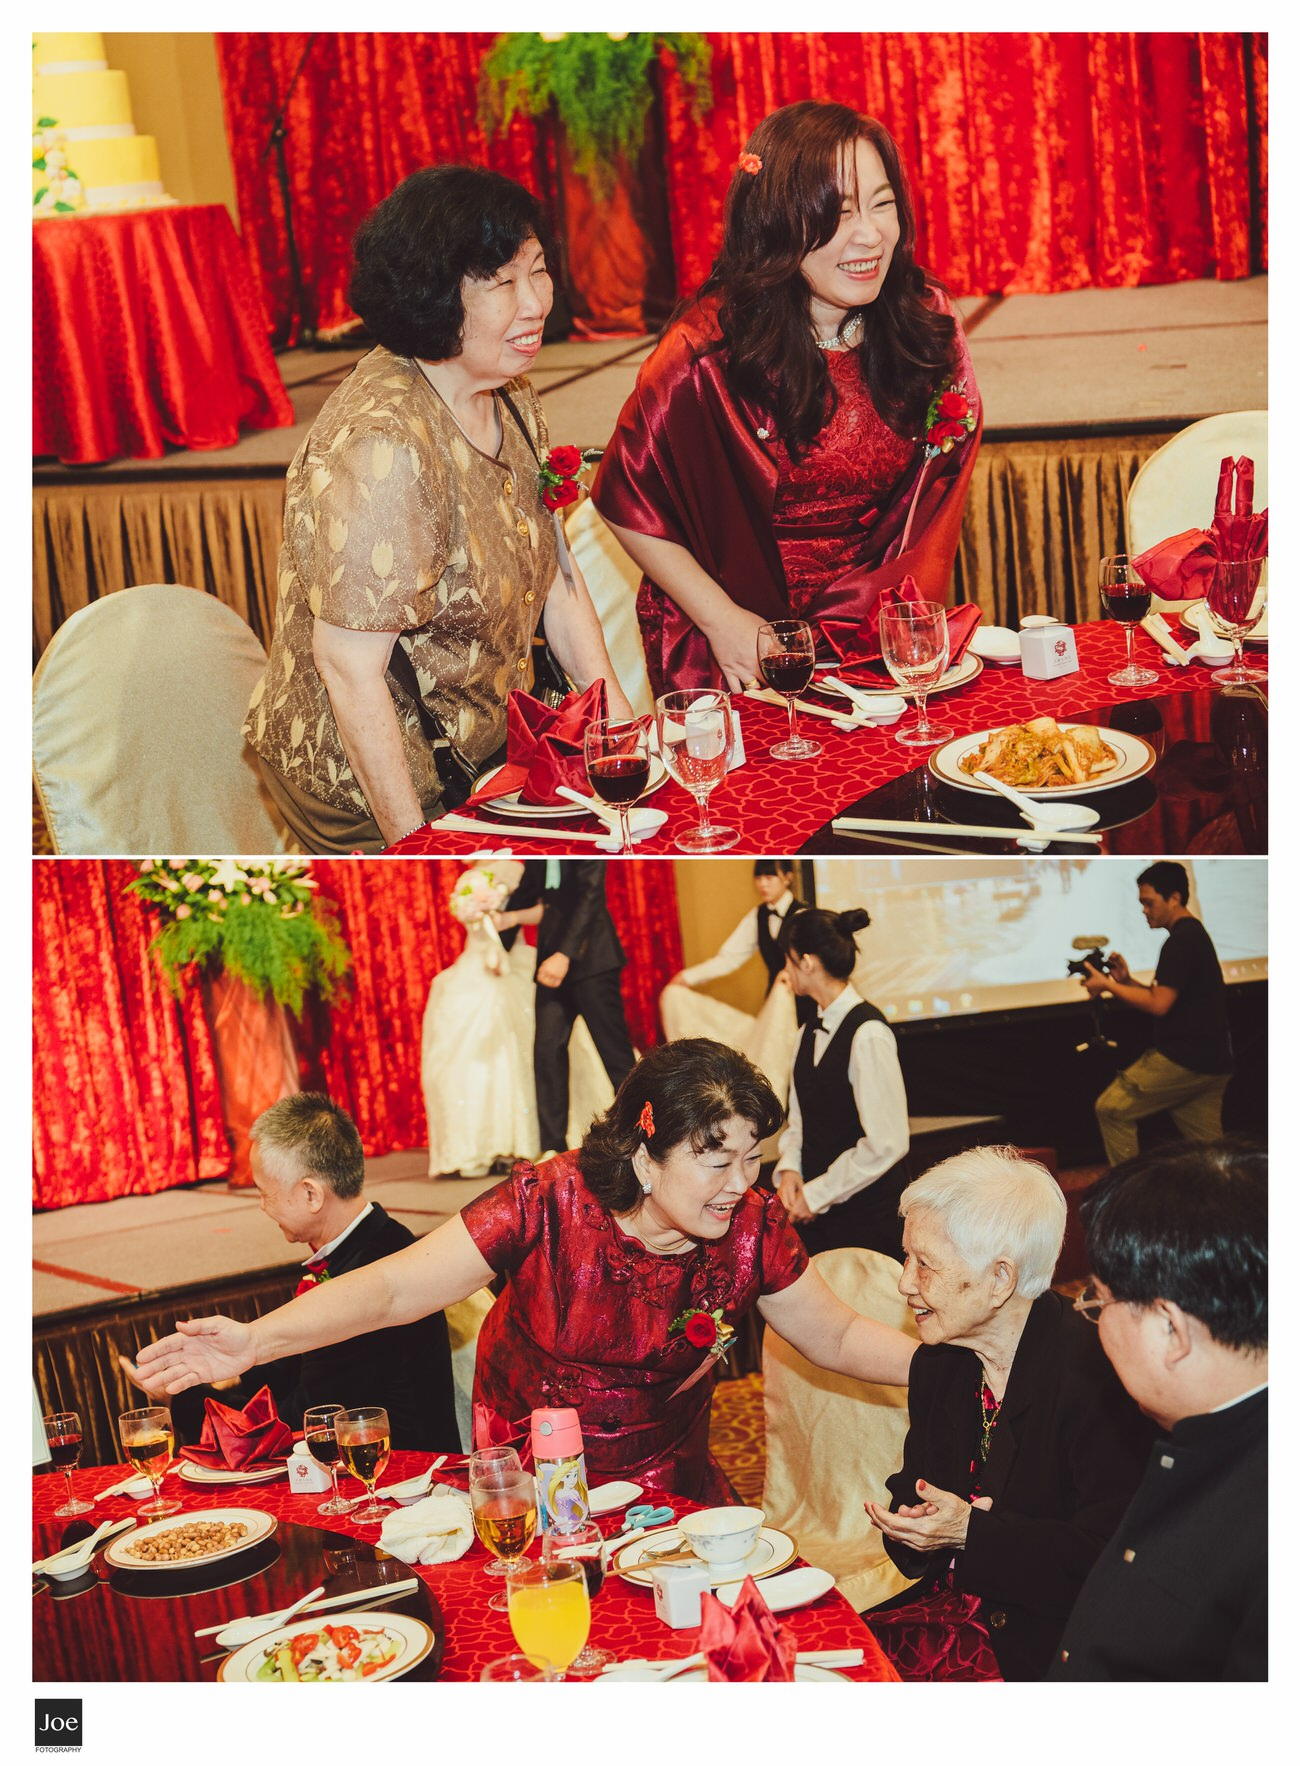 sunworld-dynasty-hotel-taipei-wedding-photo-joe-fotography-angel-jay-086.jpg